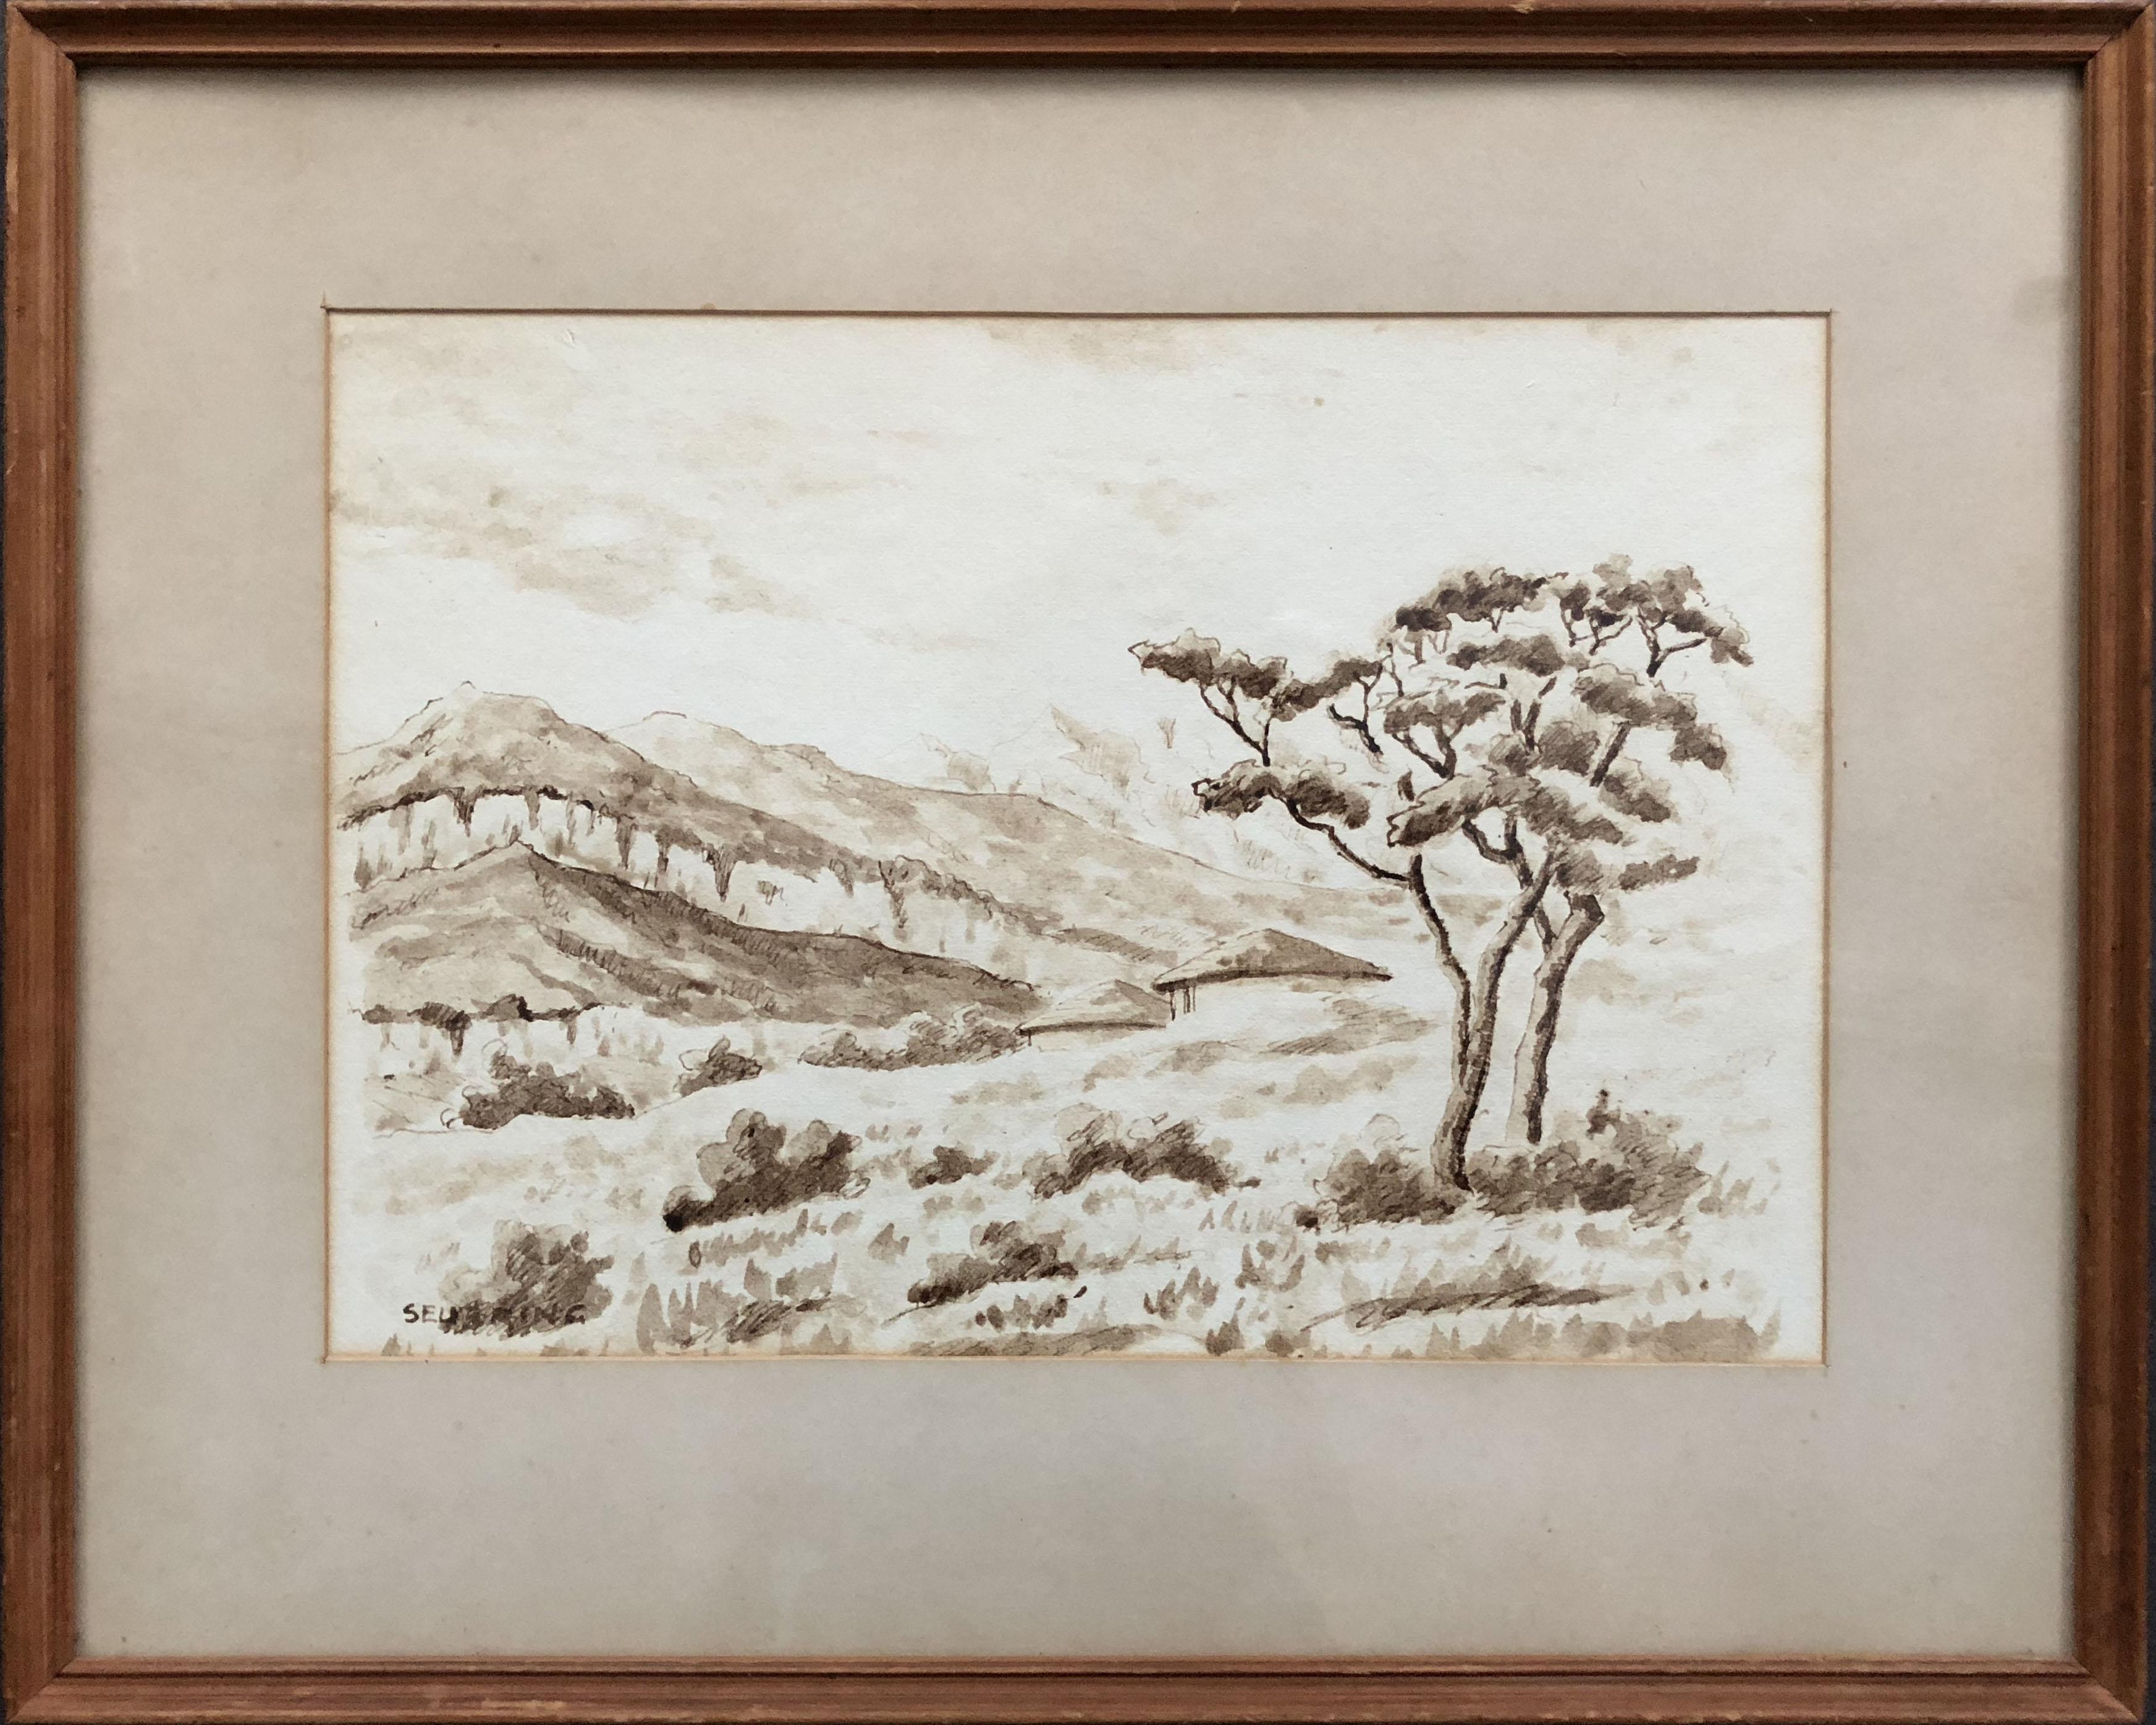 G. Seubring, Afrikaans landschap, linksonder gesigneerd, sepia, 22 x 30 cm